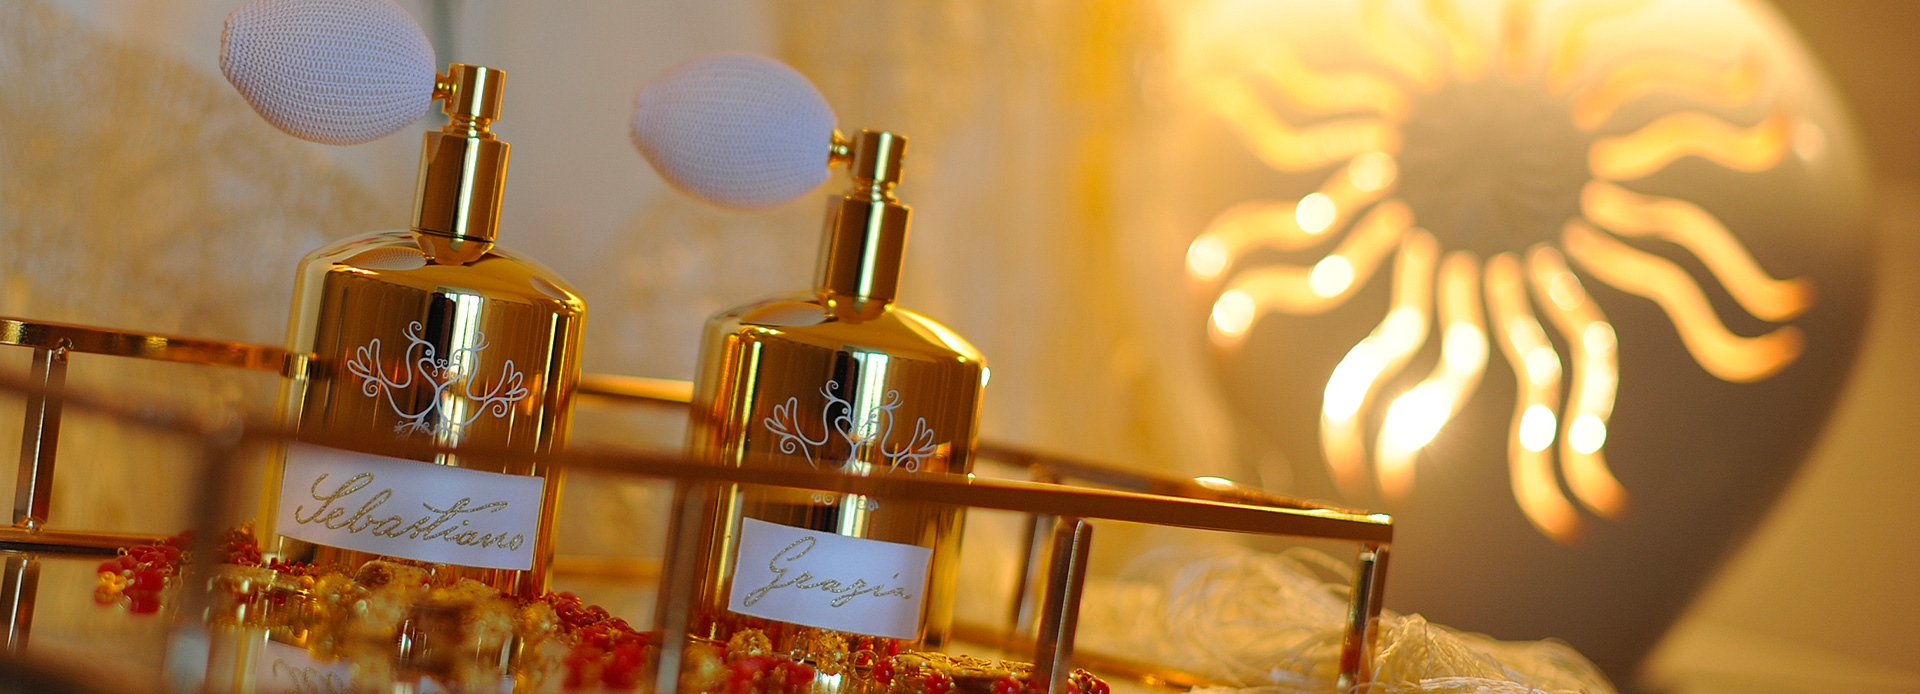 Nuovi eau de parfum Sebastiano e Grazia